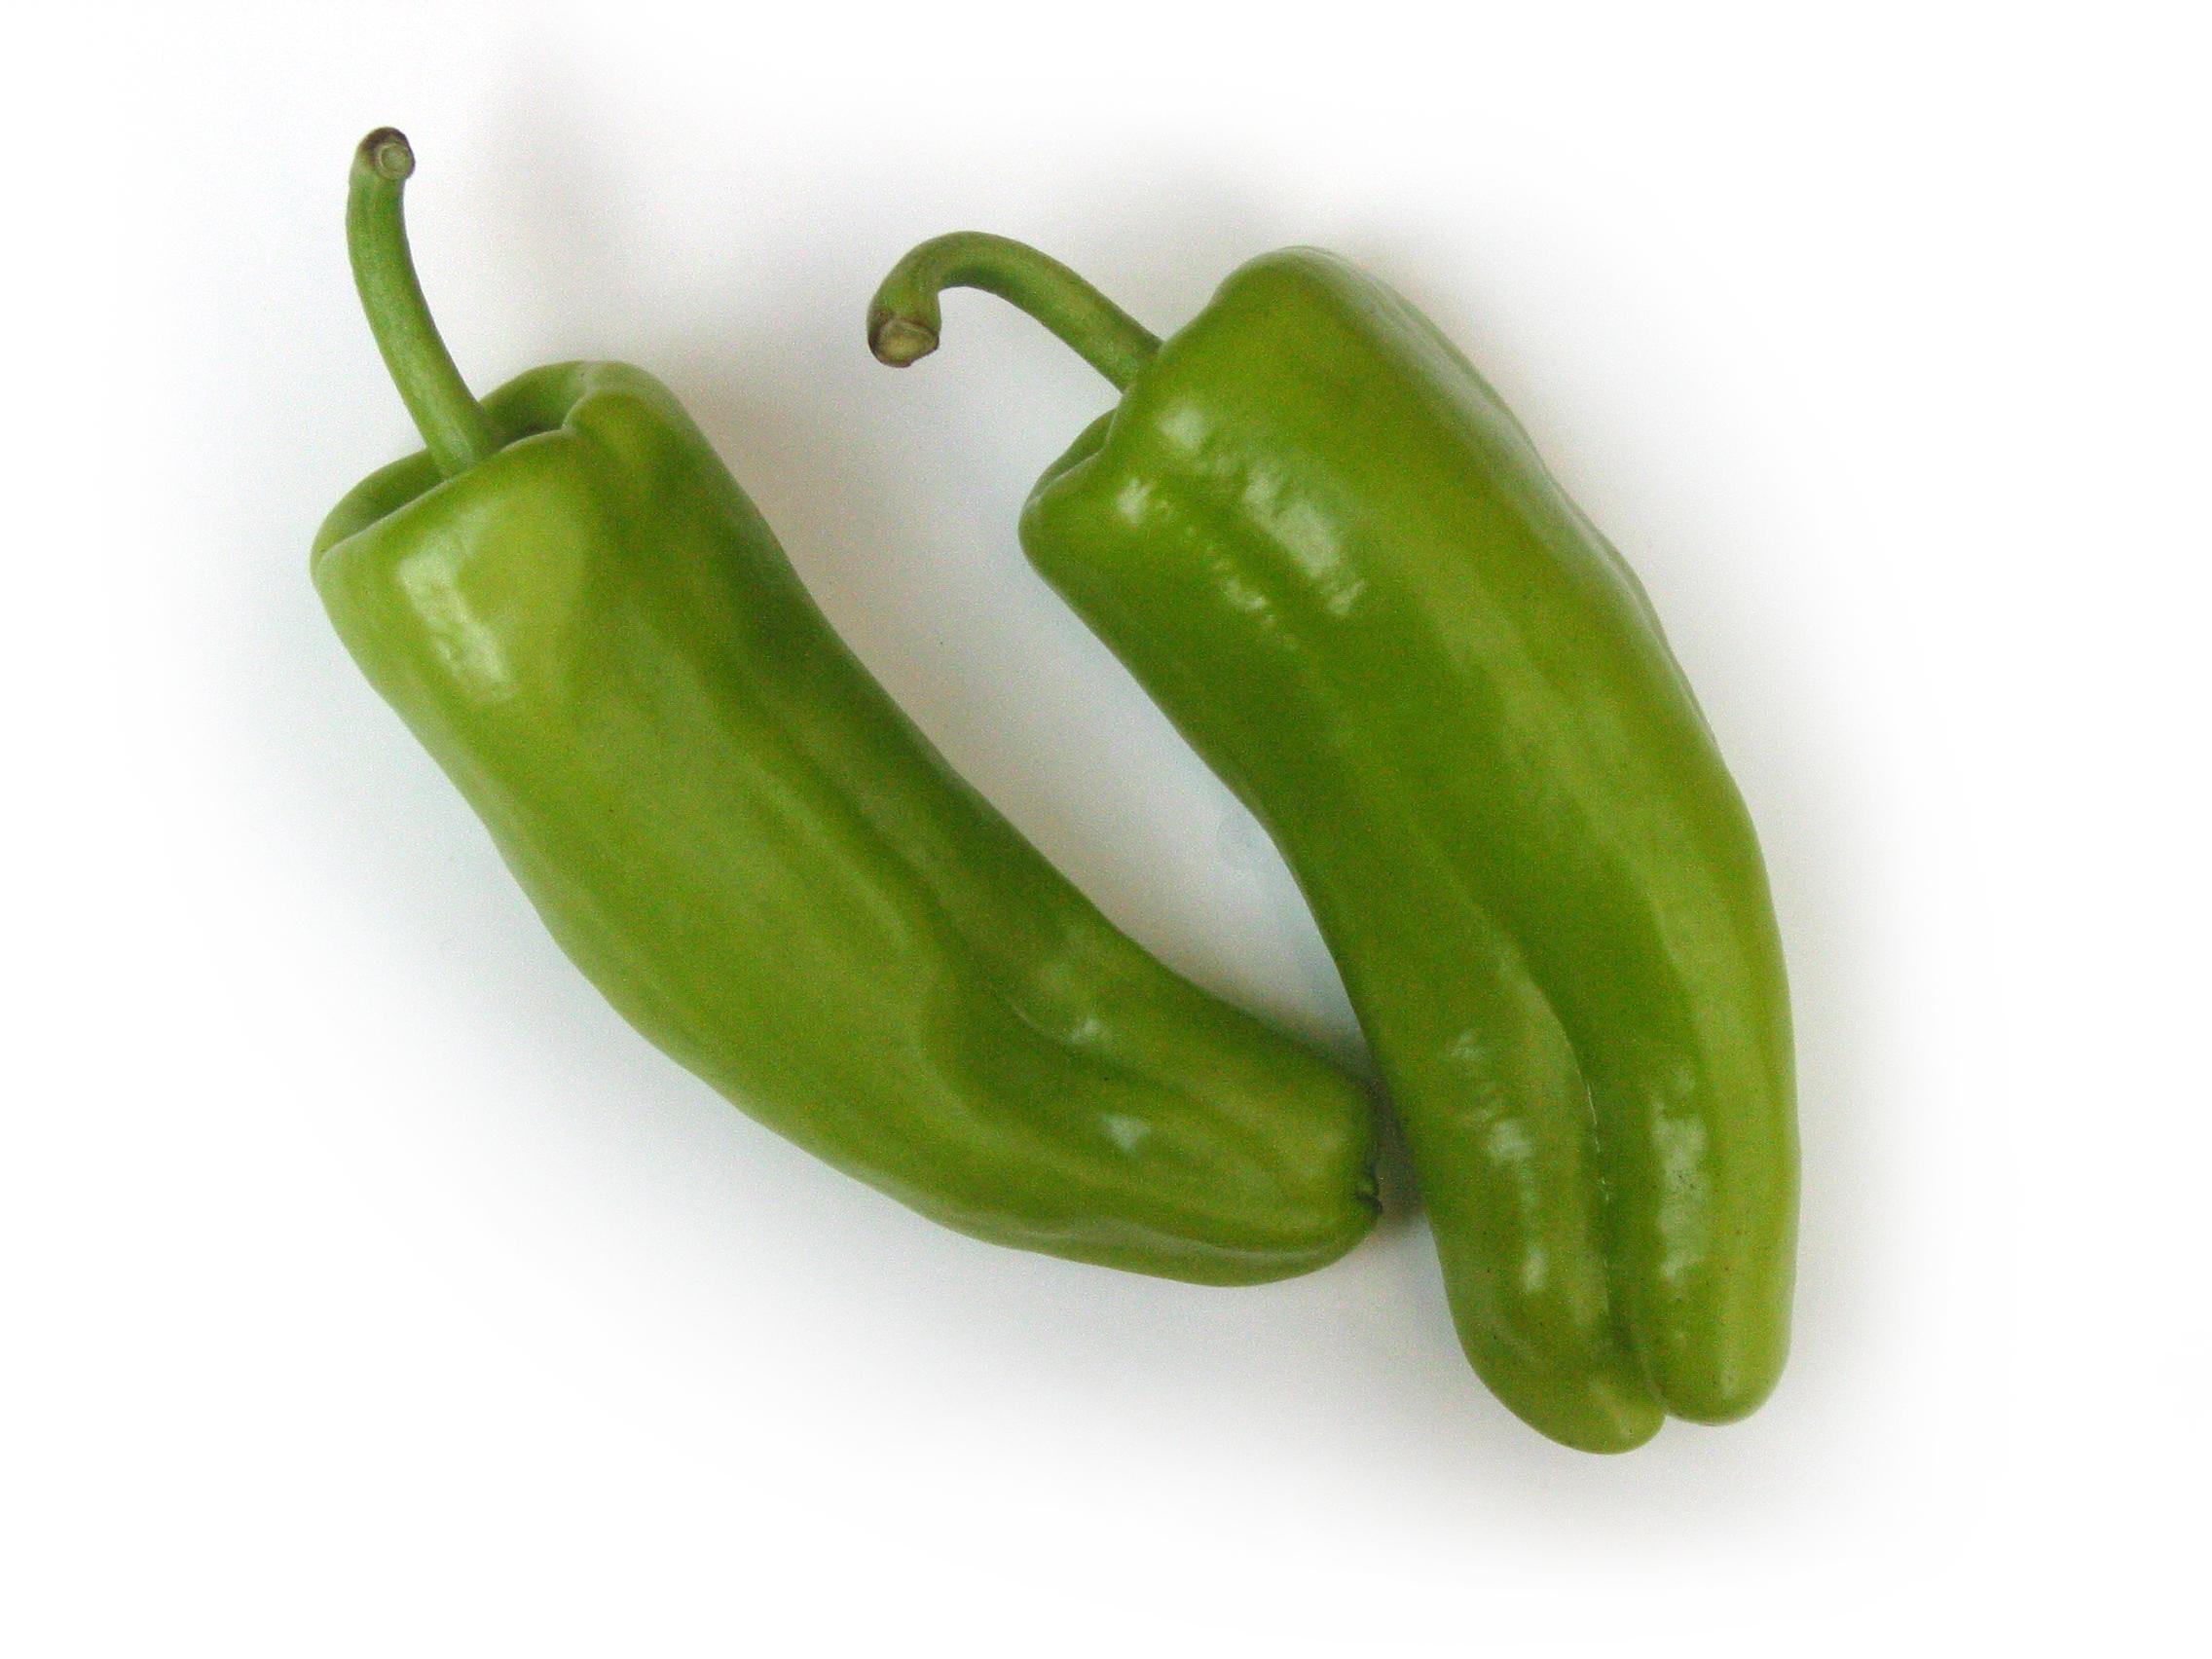 Chili, FREE Stock Photo, Image, Picture: Hot Green Chili ...